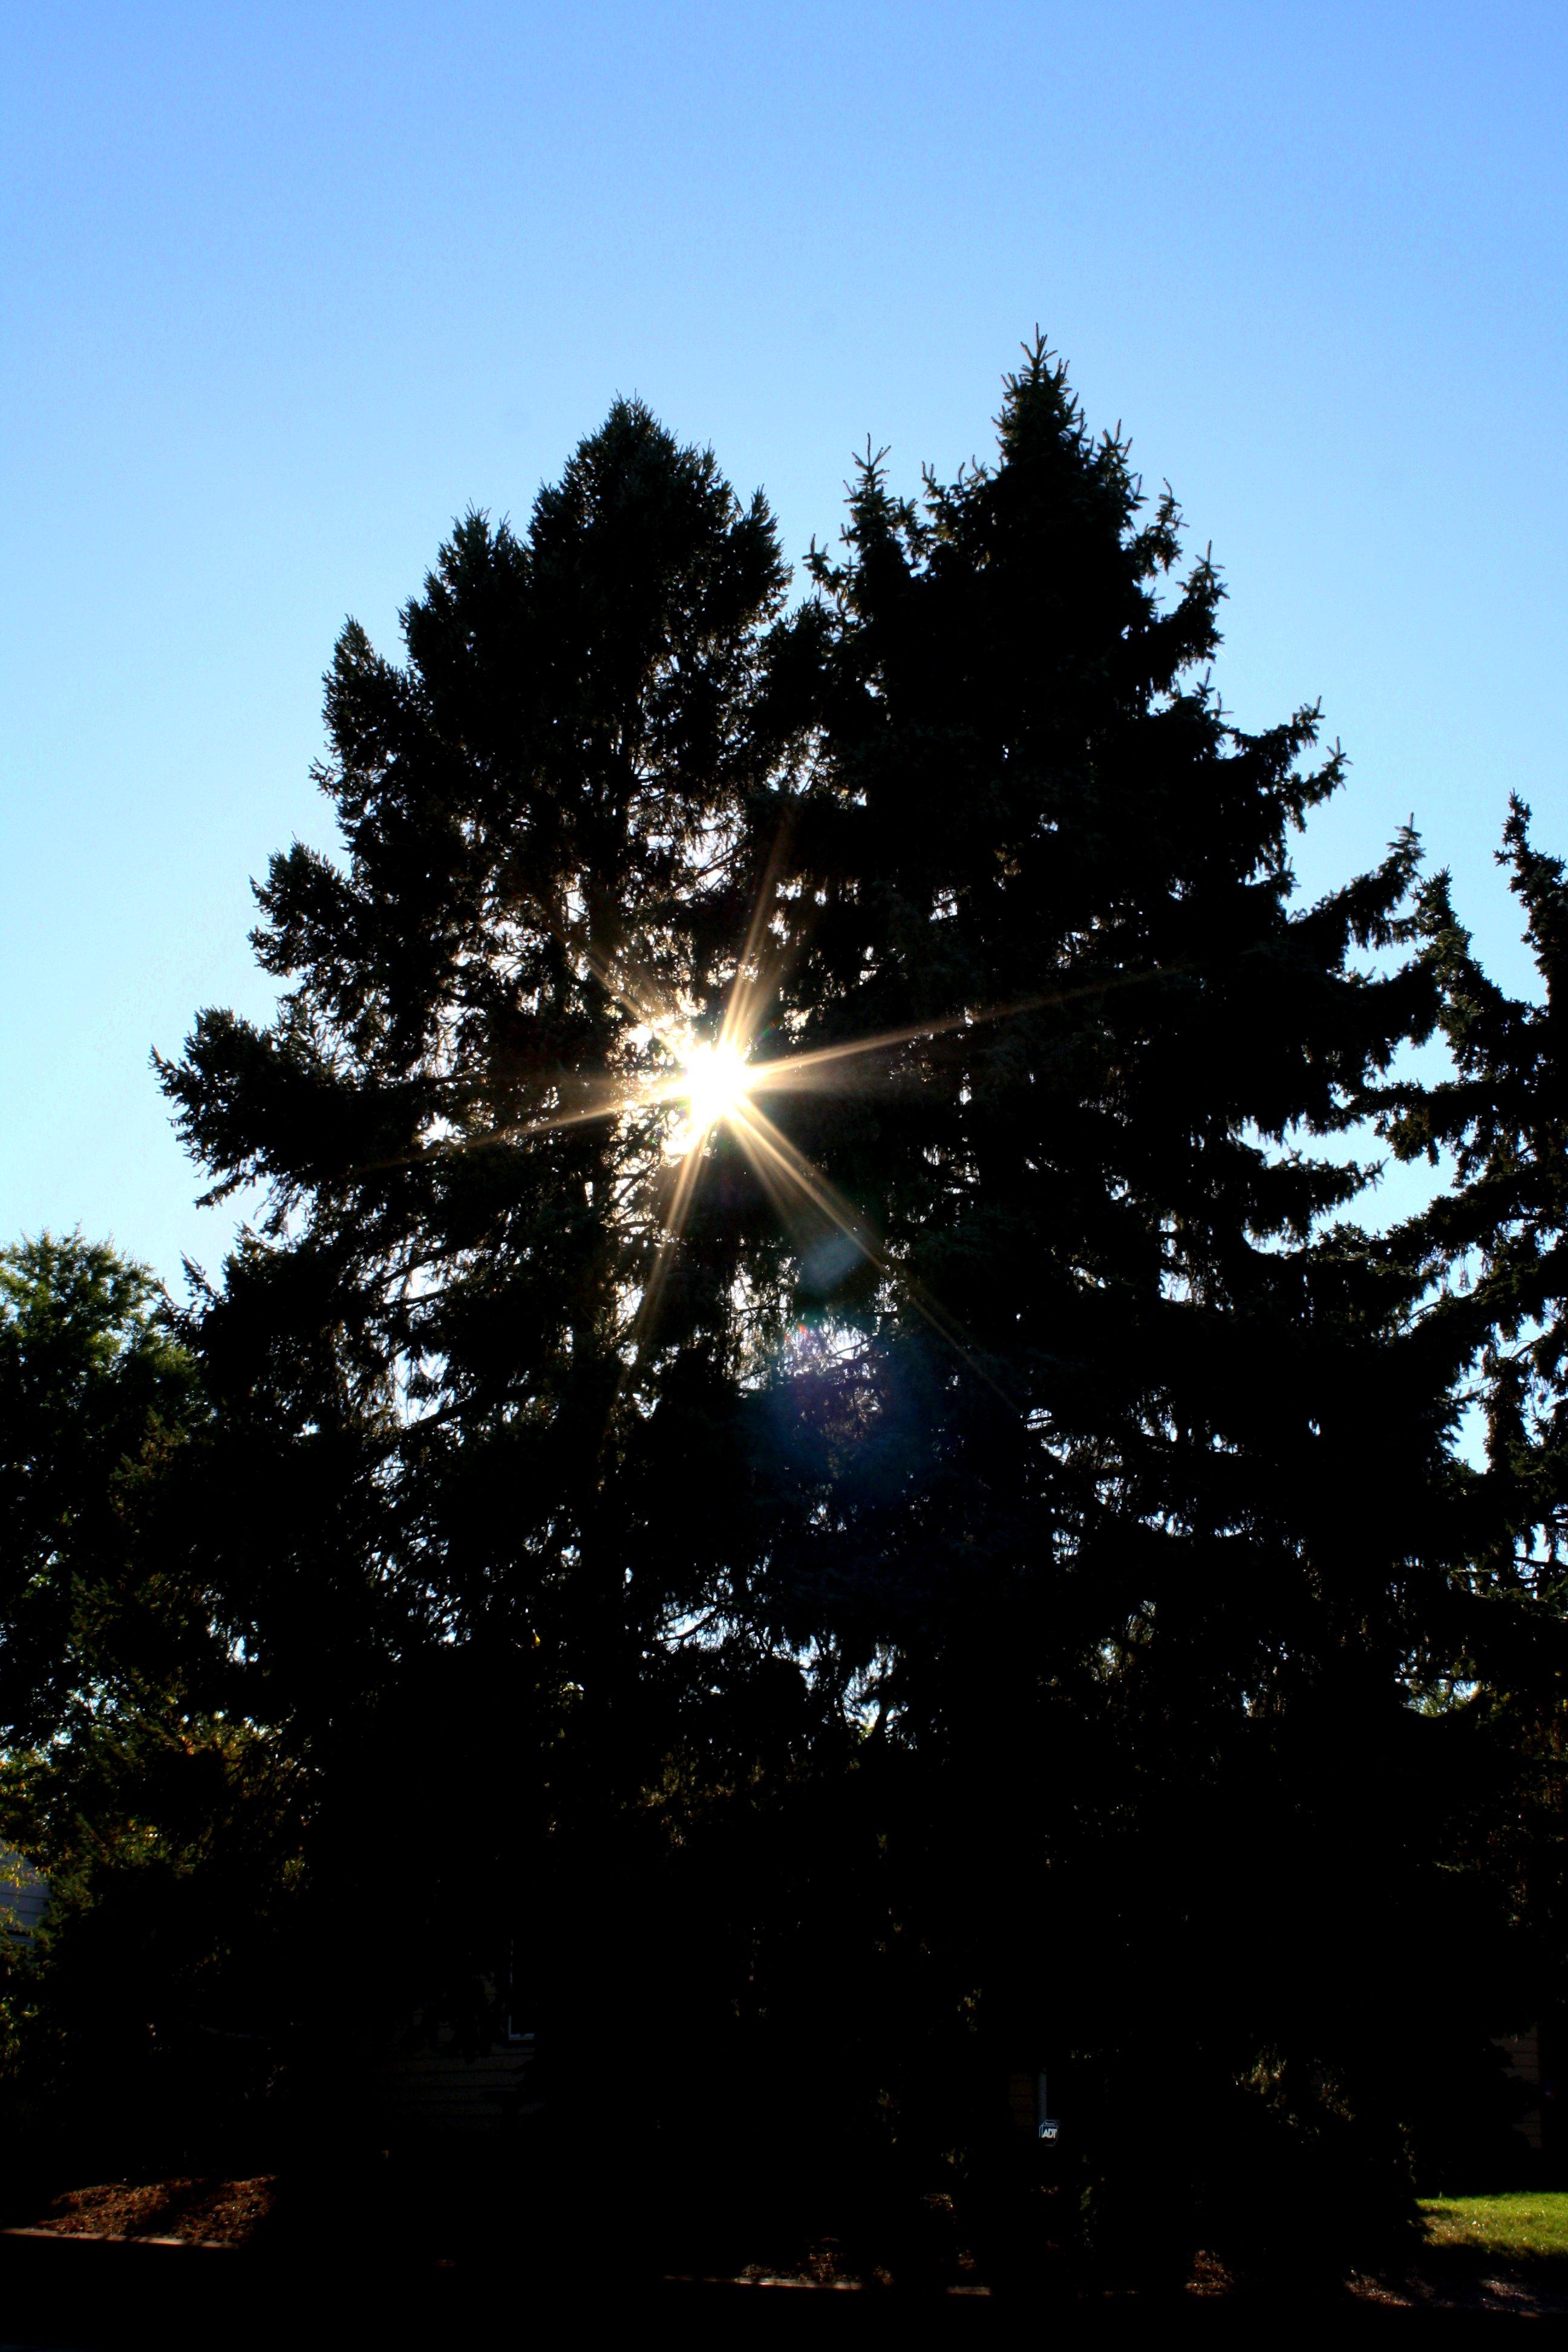 Sun Shining Drawing Sun Shining Through Pine Trees